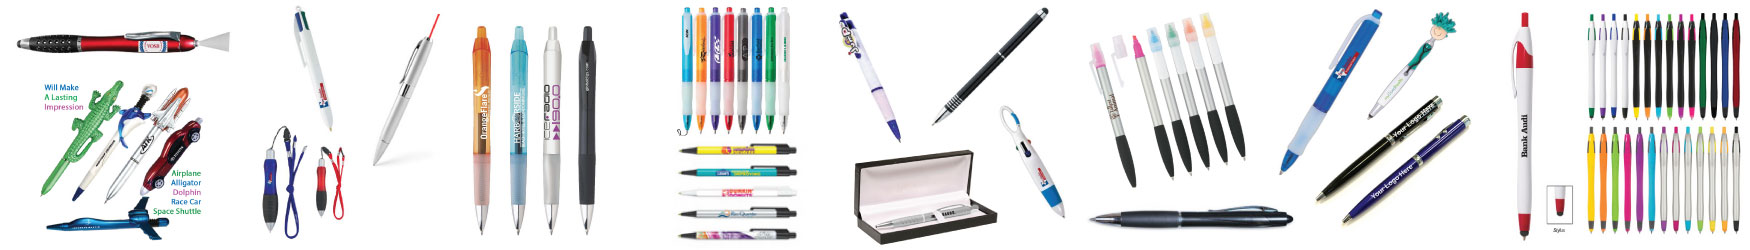 Logo pens, gel ink pens, roller ball, retractable pens, ball point pens, pens with stylus, BIC, Pilot, Scheafer